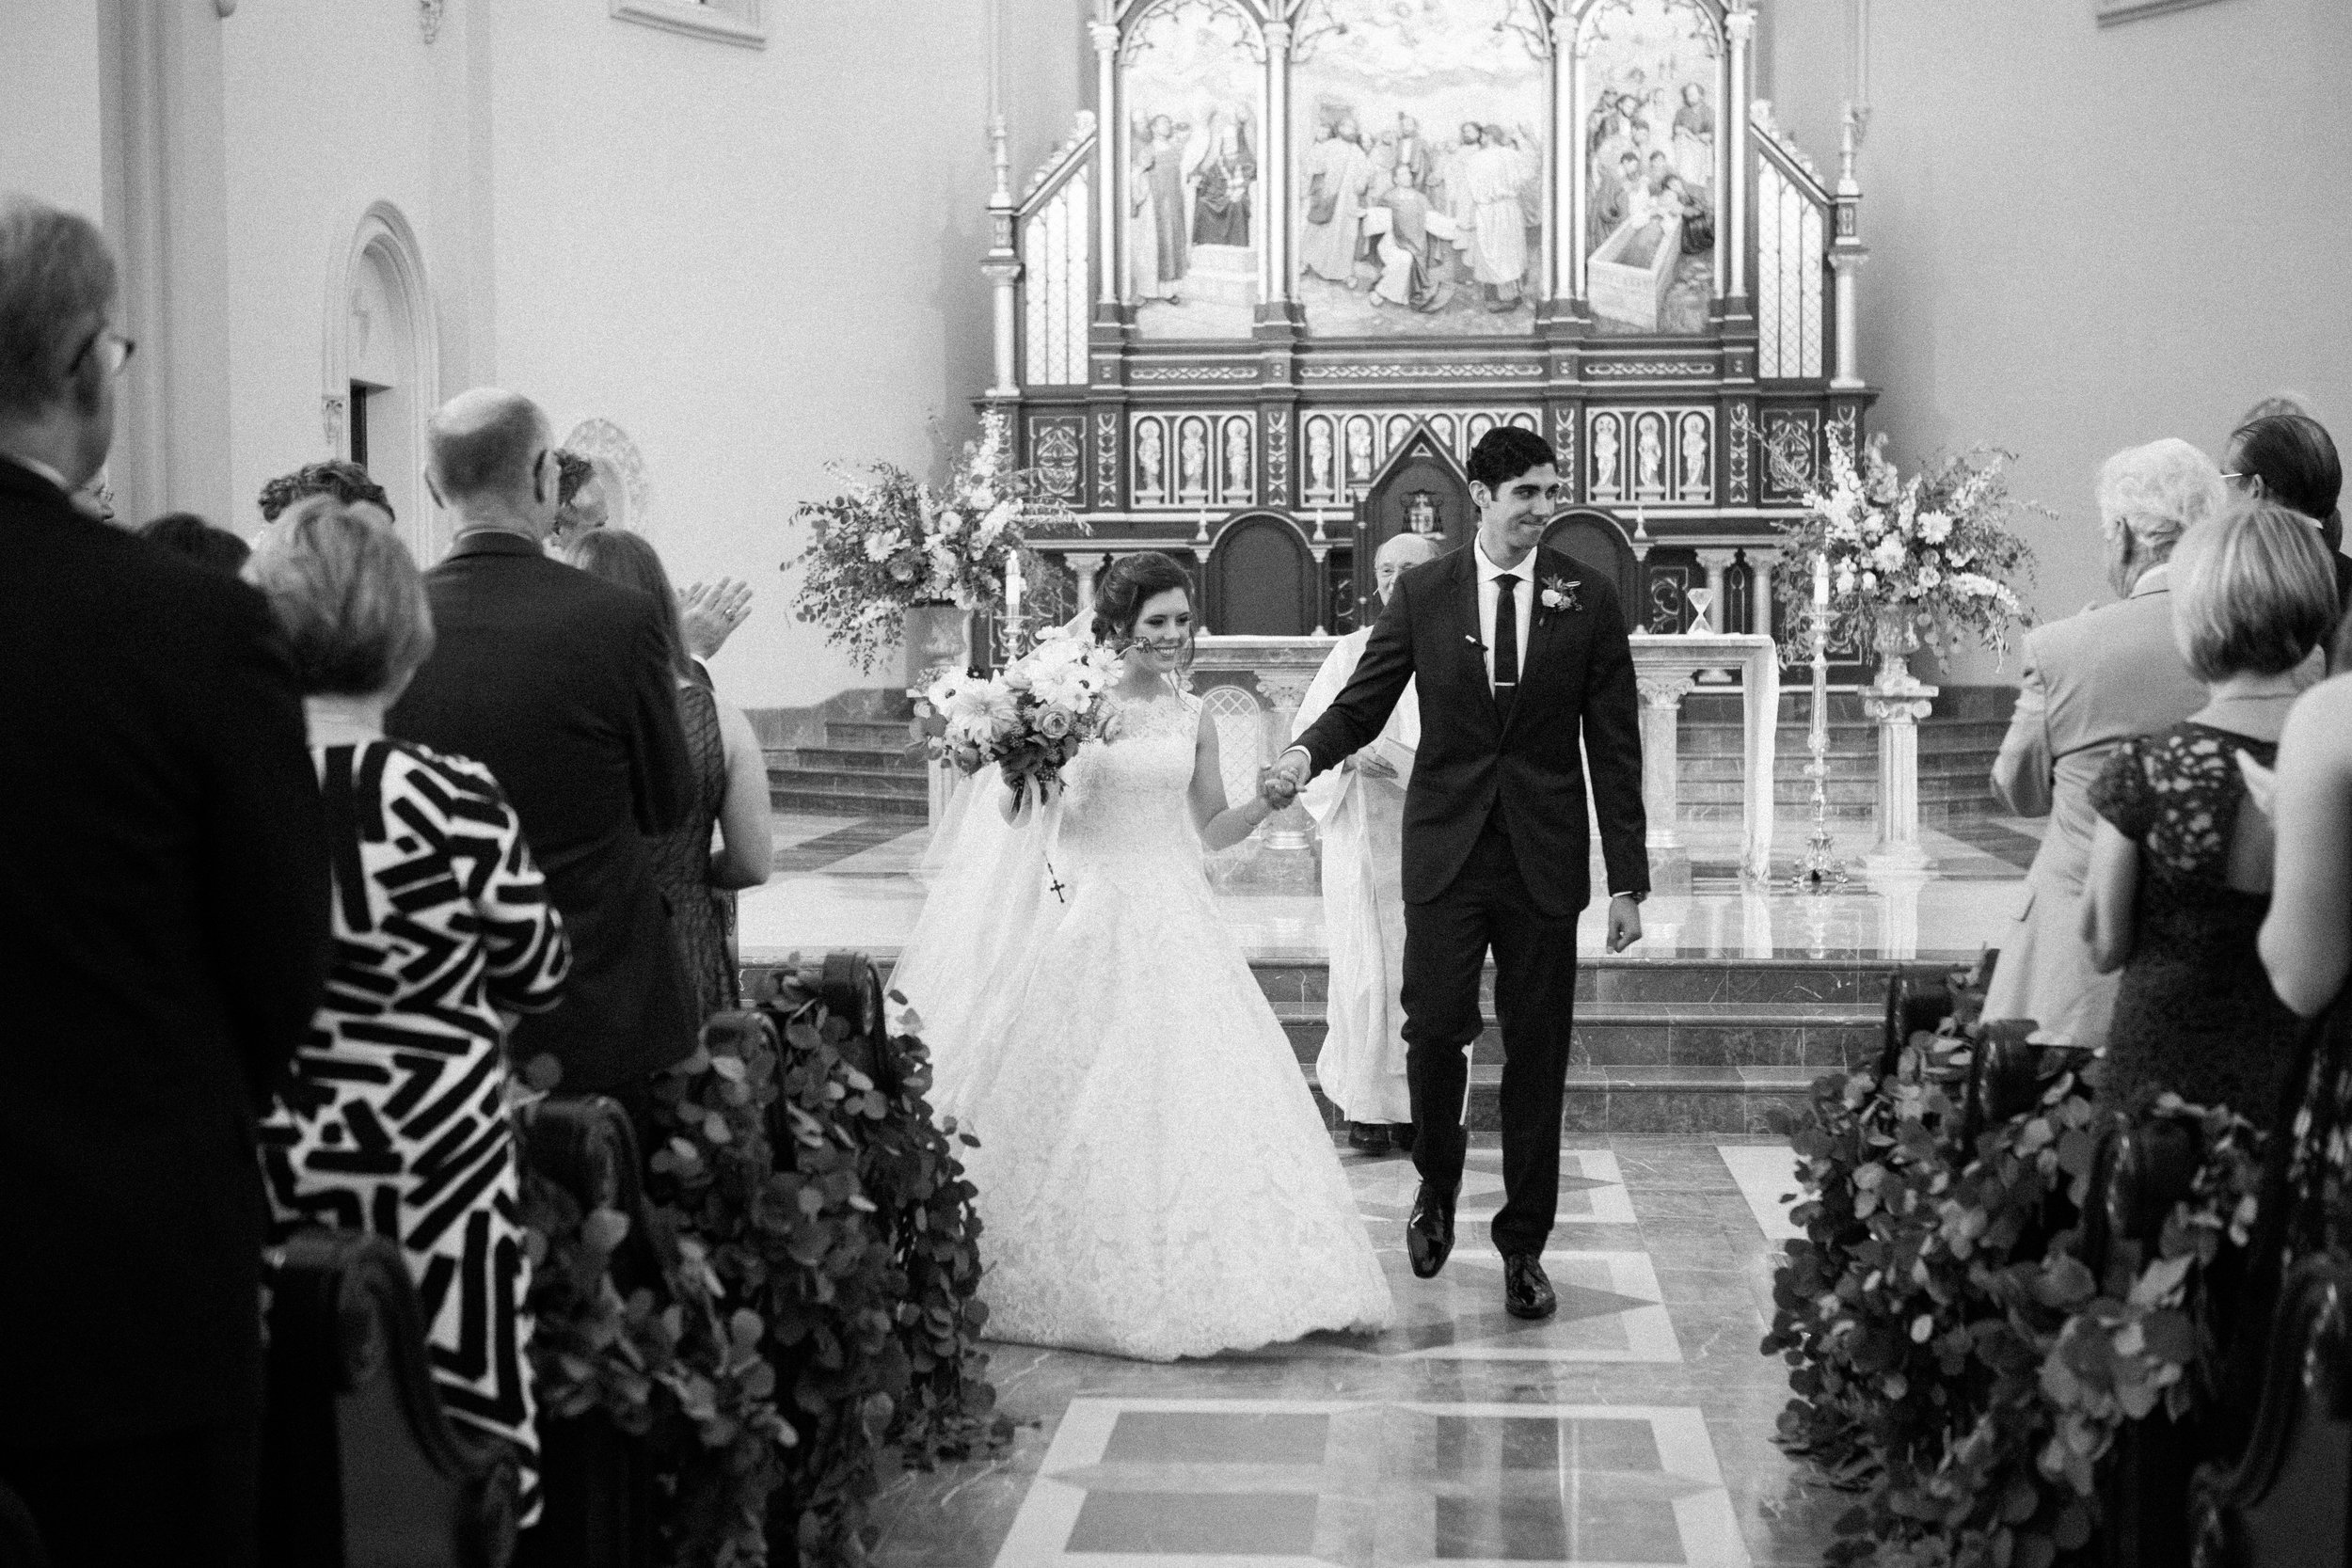 St Stephens Cathedral Owensboro Kentucky wedding